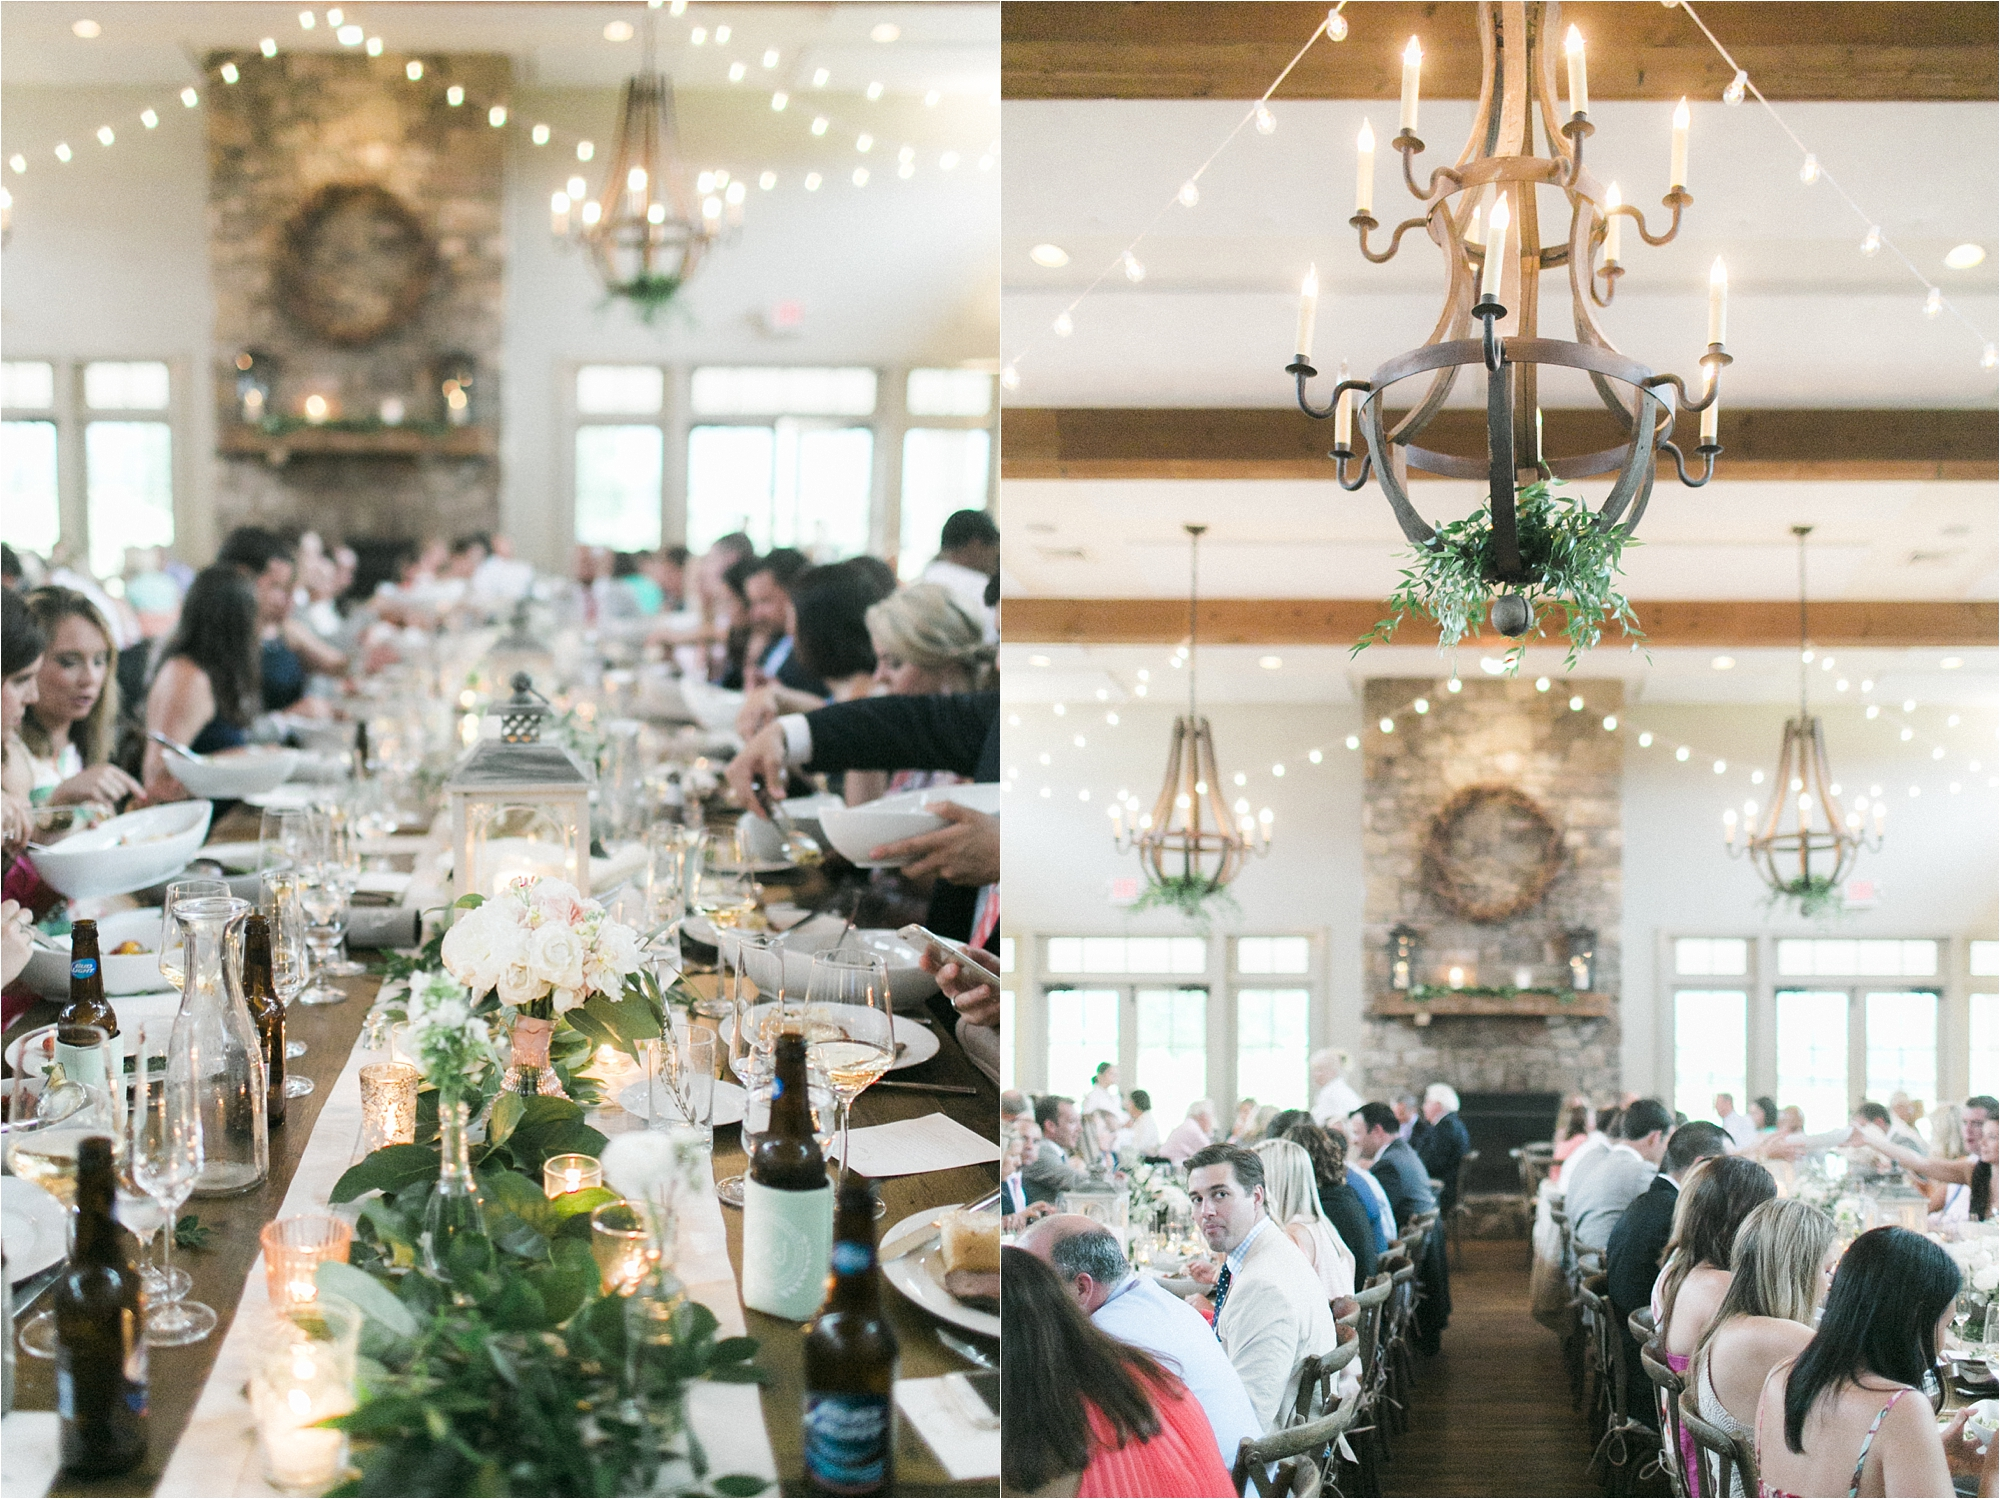 stephanie-yonce-charlottesville-virginia-king-family-vineyard-wedding-photos_0053.jpg